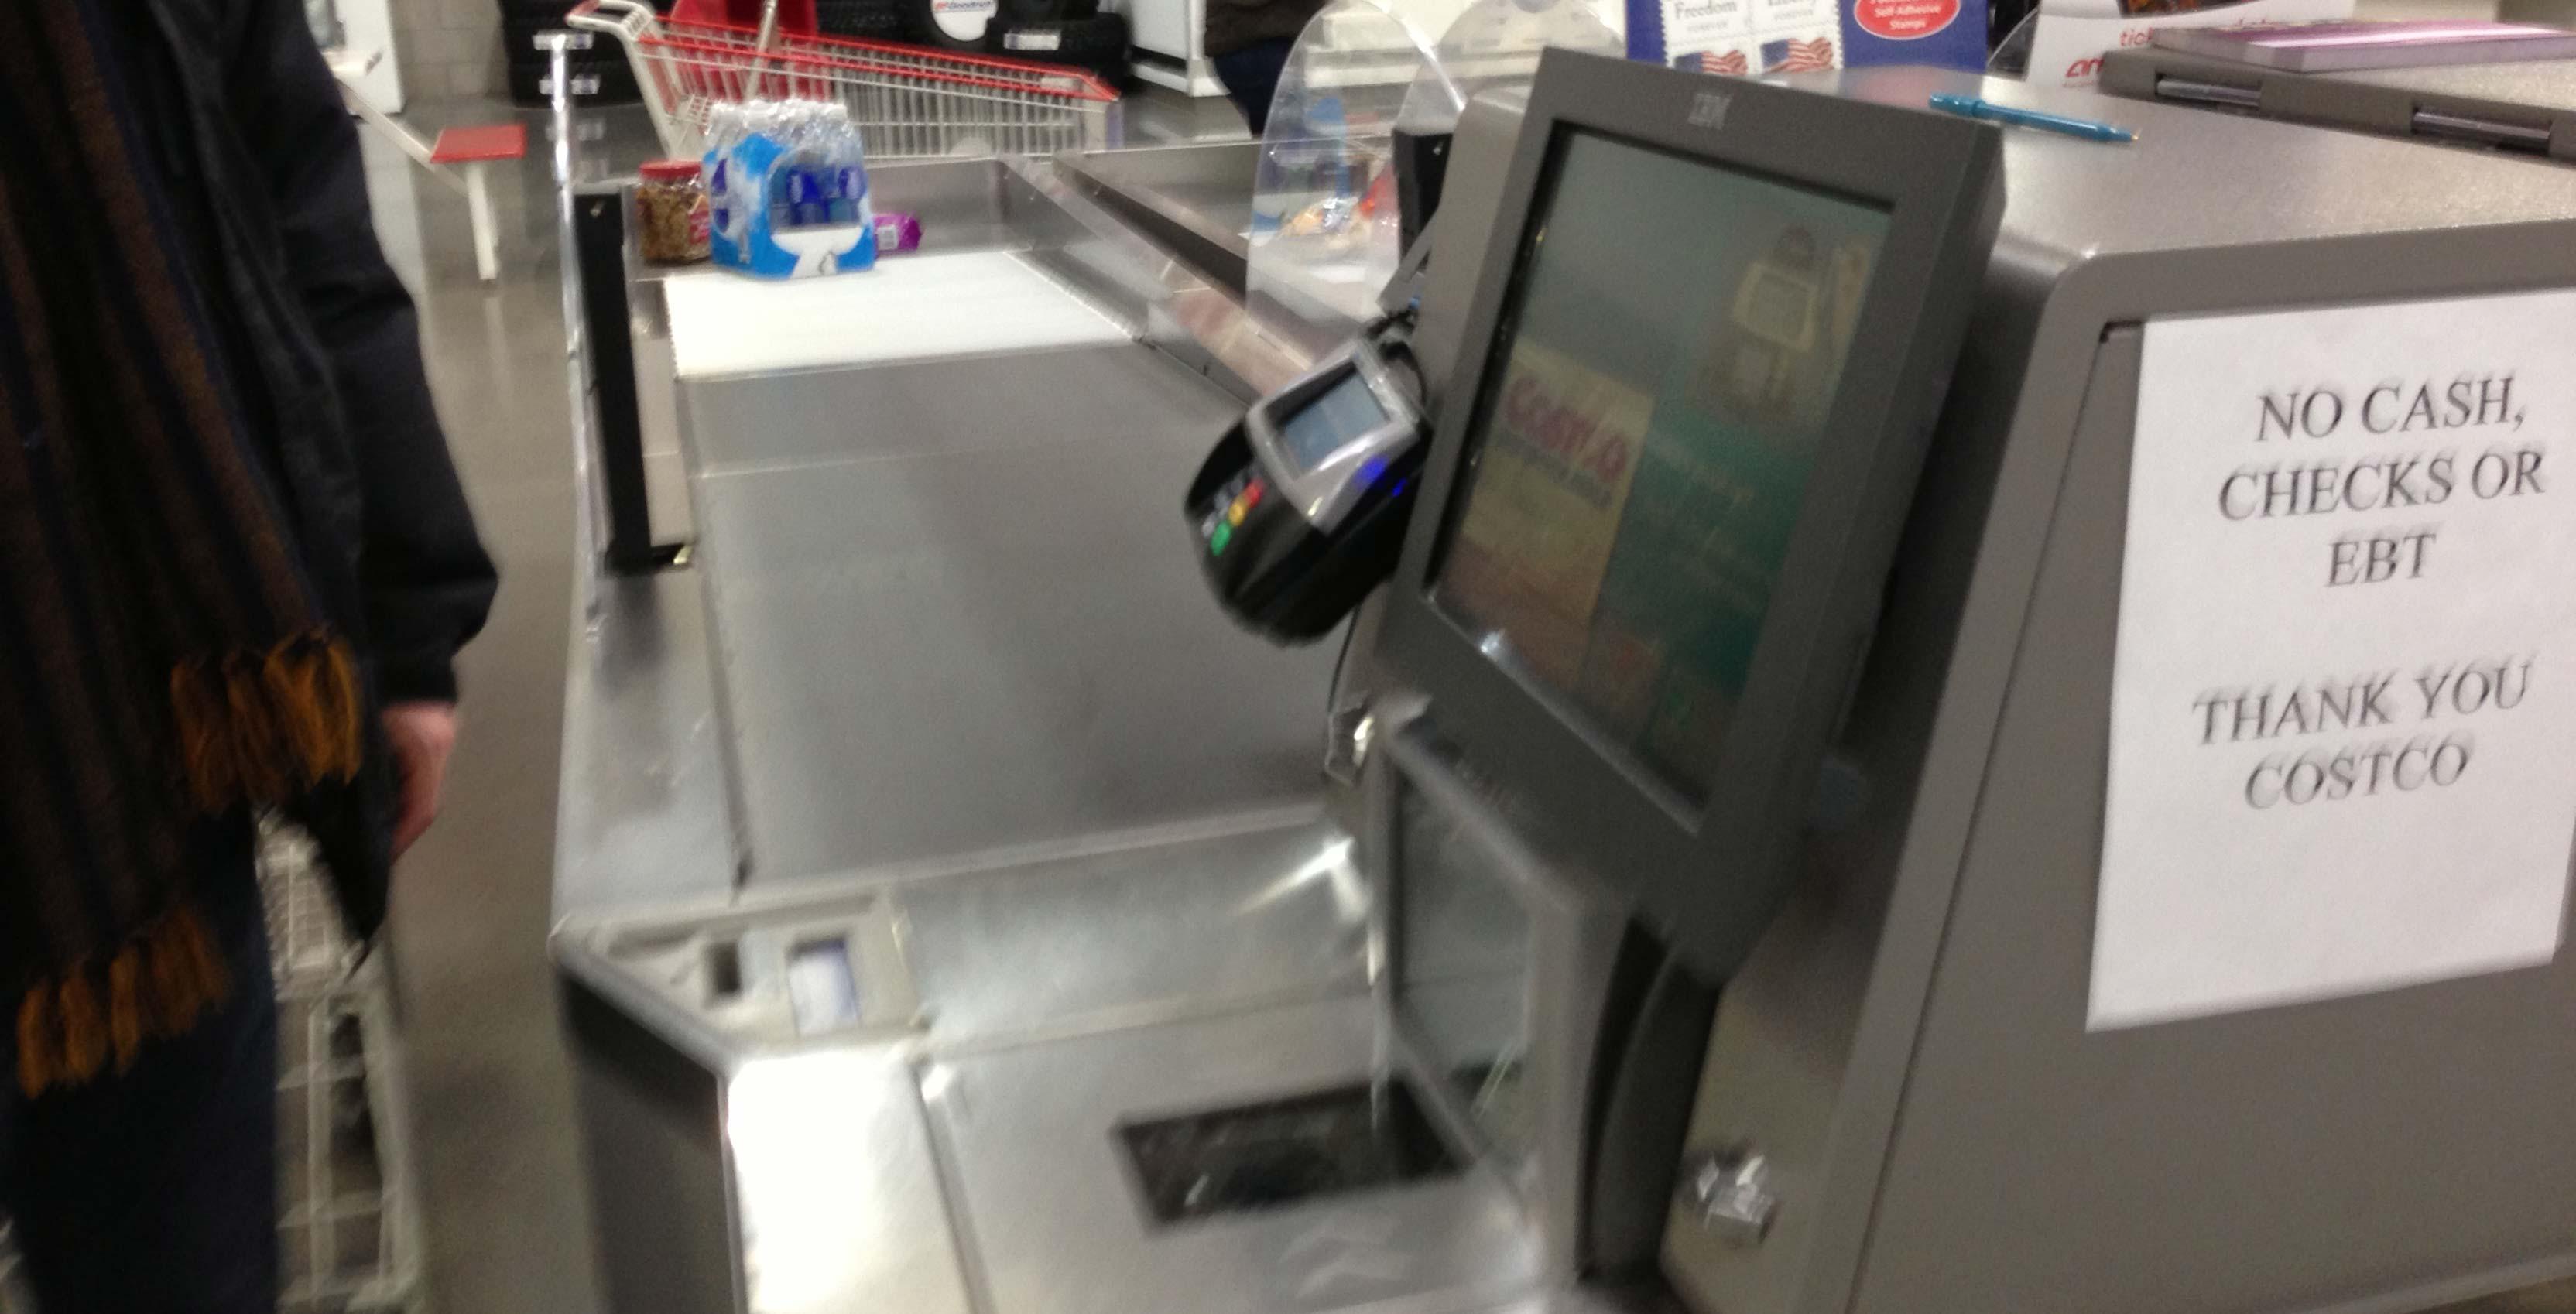 self-checkout kiosk